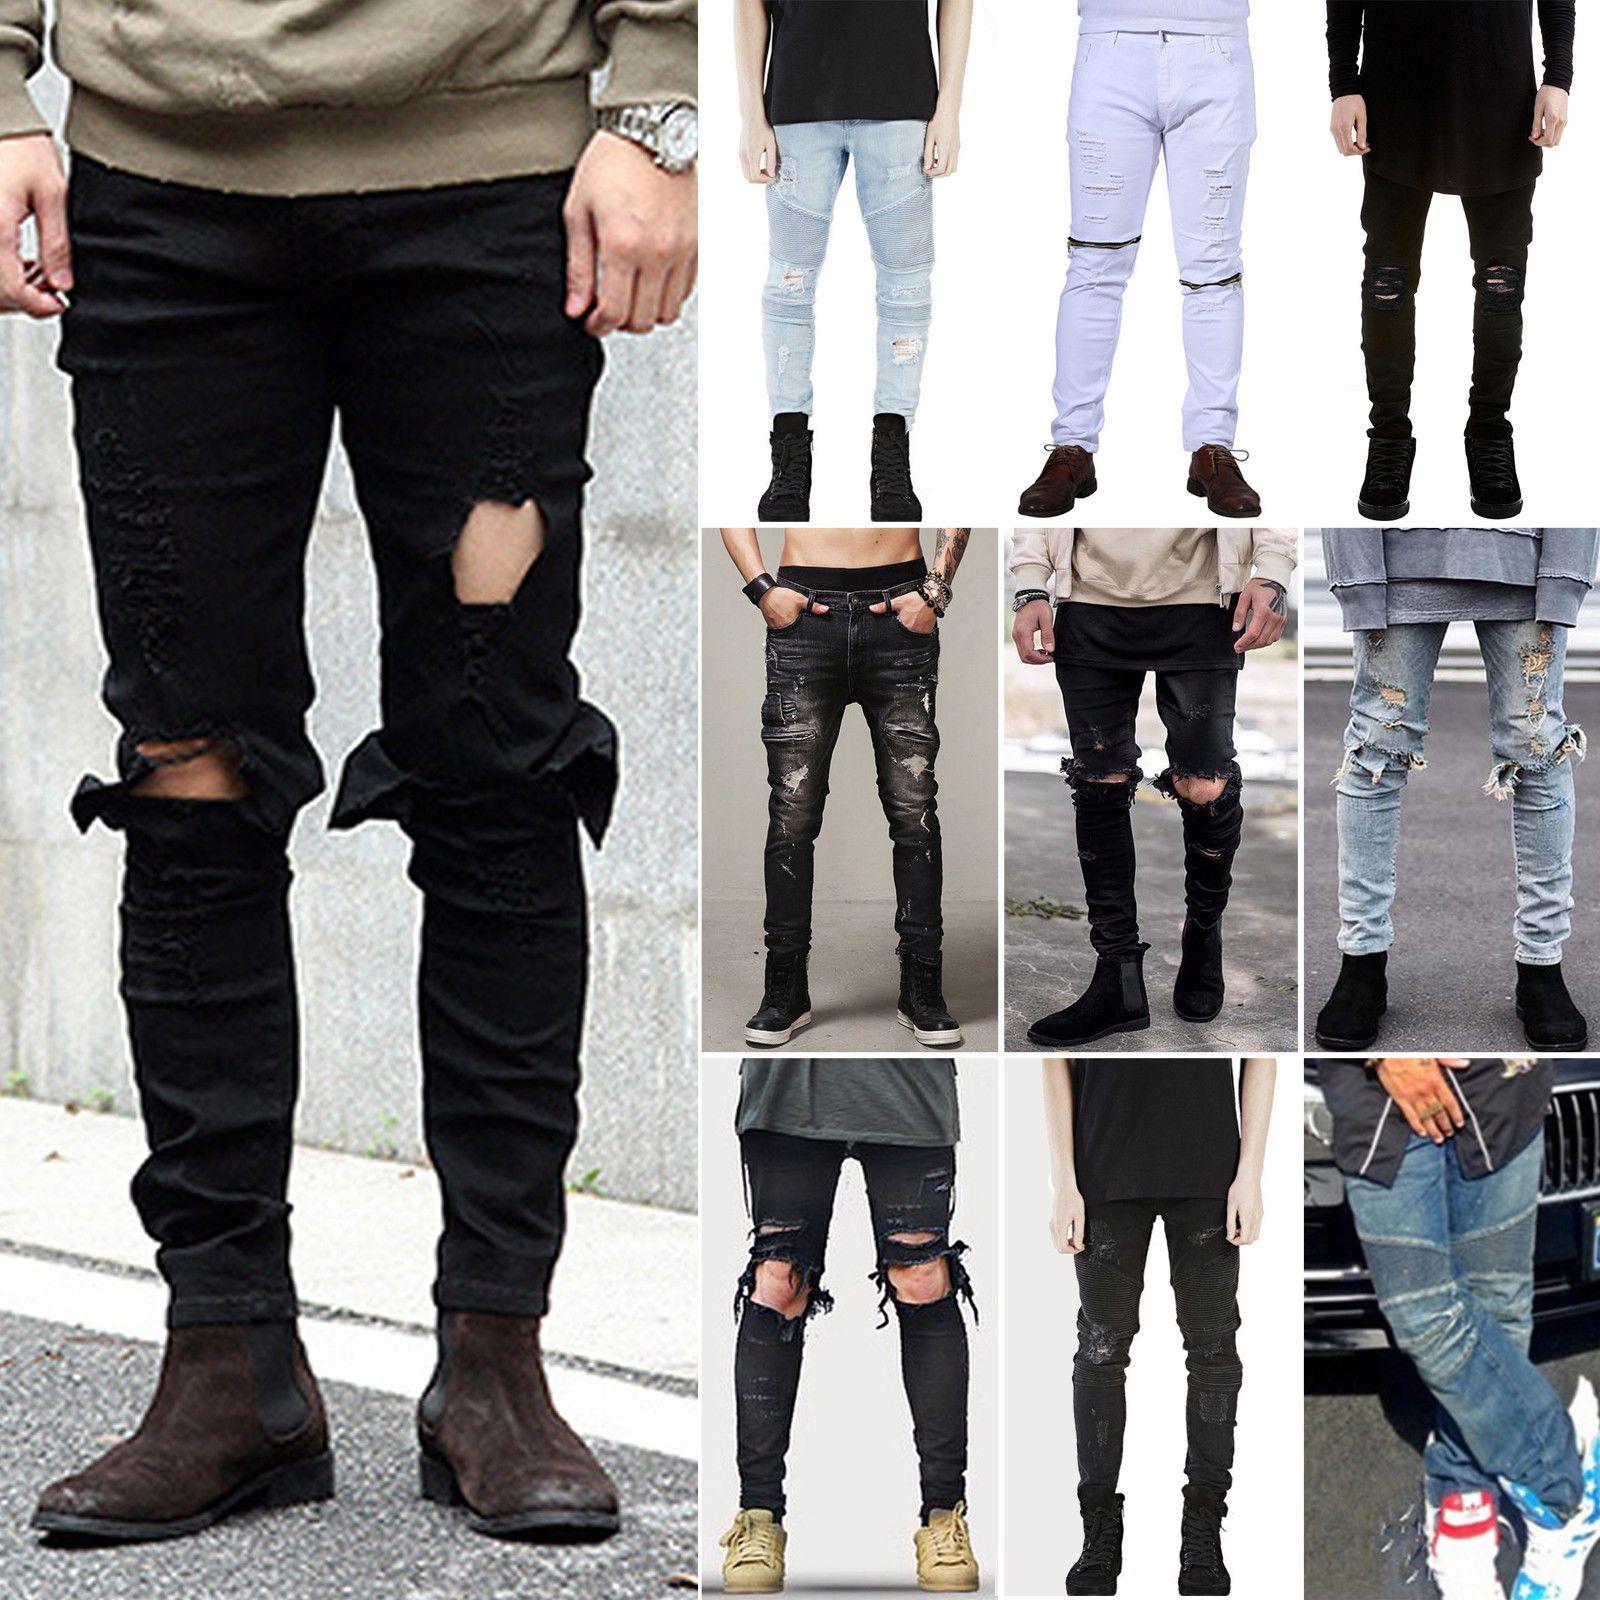 Melodican Imigracija Nijedan Pantalones Jeans Pitillos Rasgados Para Hombres Herbandedi Org